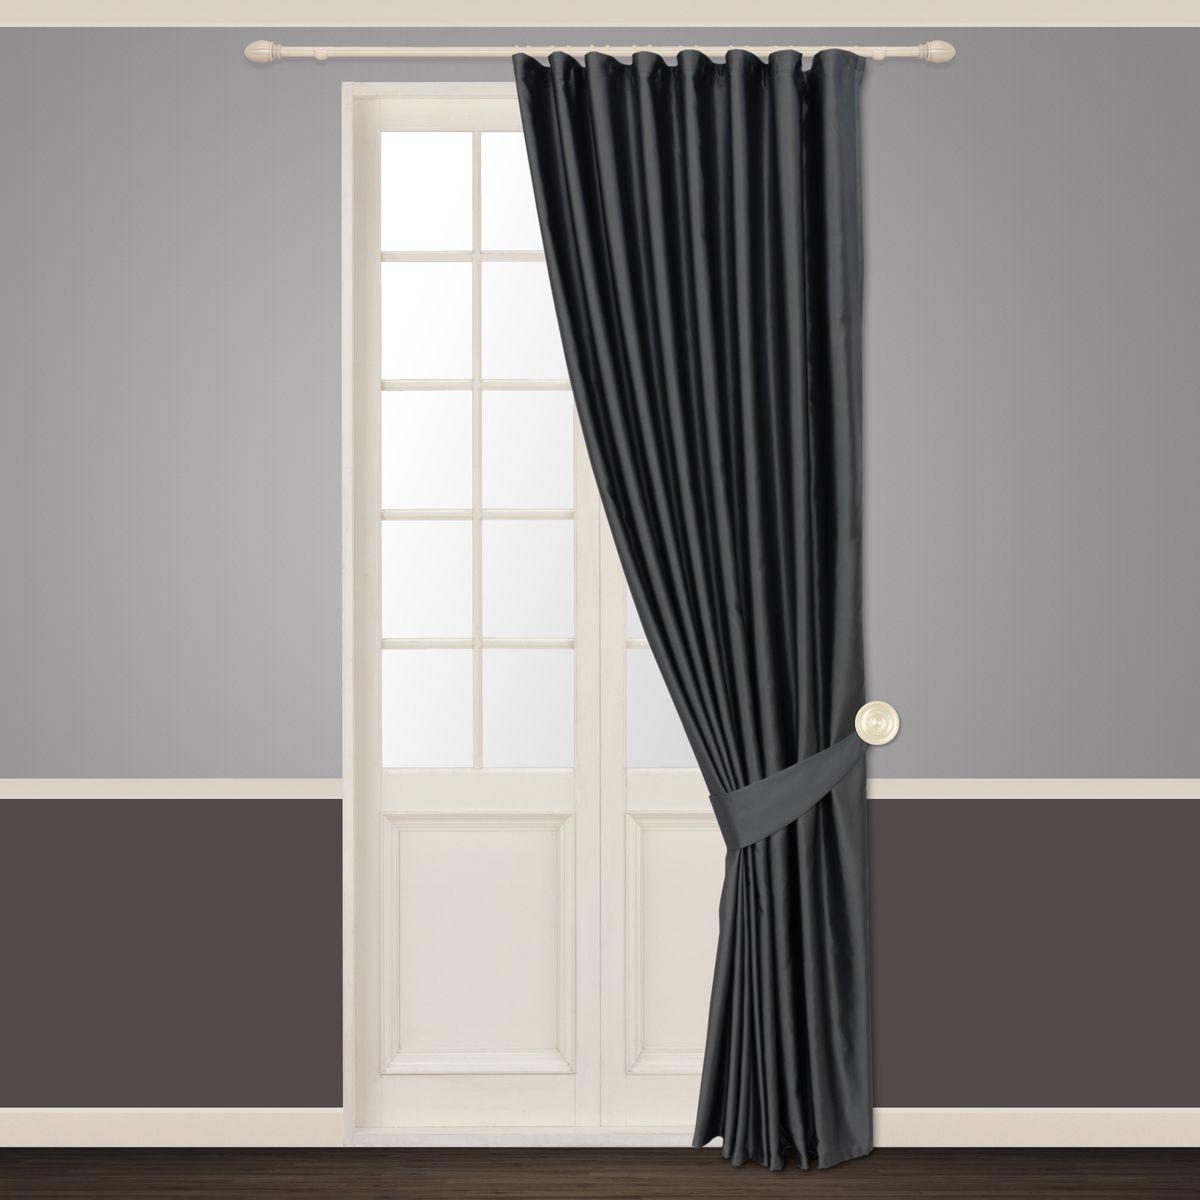 Штора Sanpa Home Collection Шания, на ленте, цвет: серый, высота 260 смHP01249/34/1E Шания серый, , 180*260+1подхват